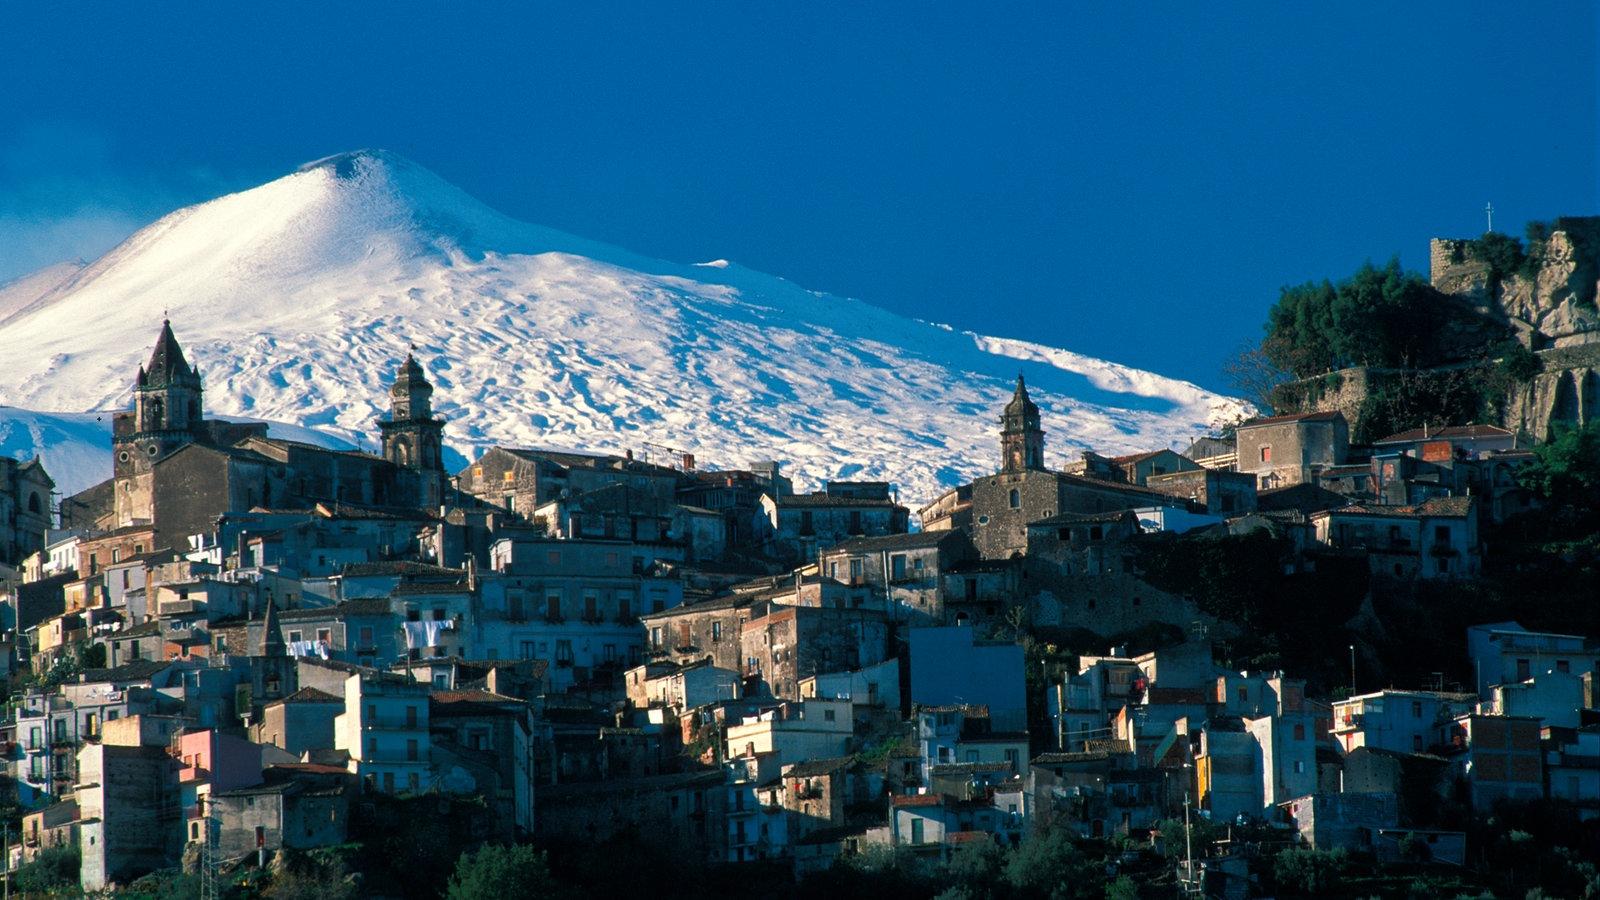 Vulkane leben mit vulkanen vulkane naturgewalten for Mit 100 dingen leben